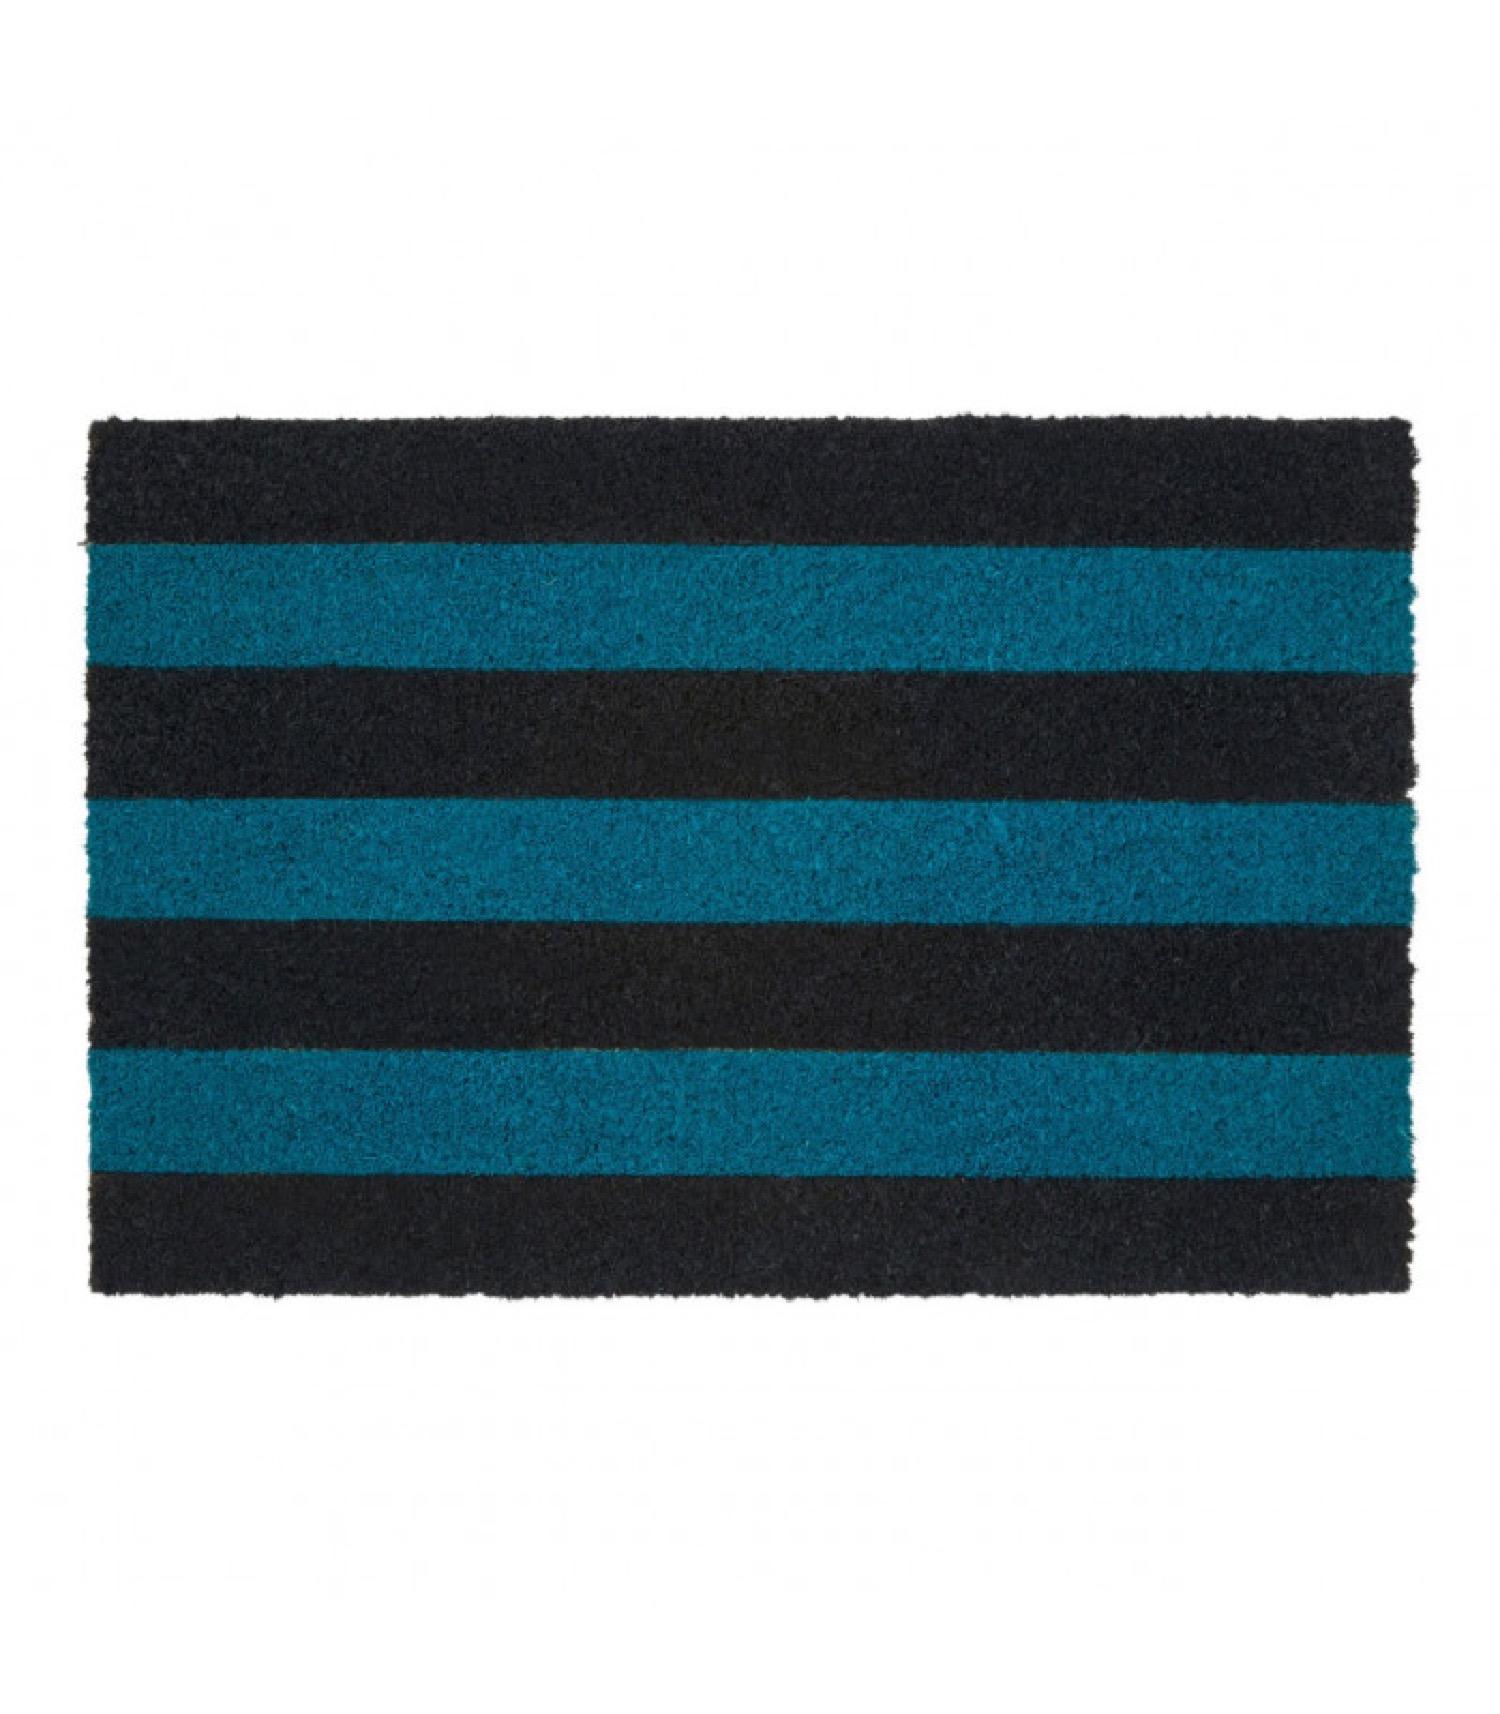 Paillasson coco rayé bleu 60x40cm